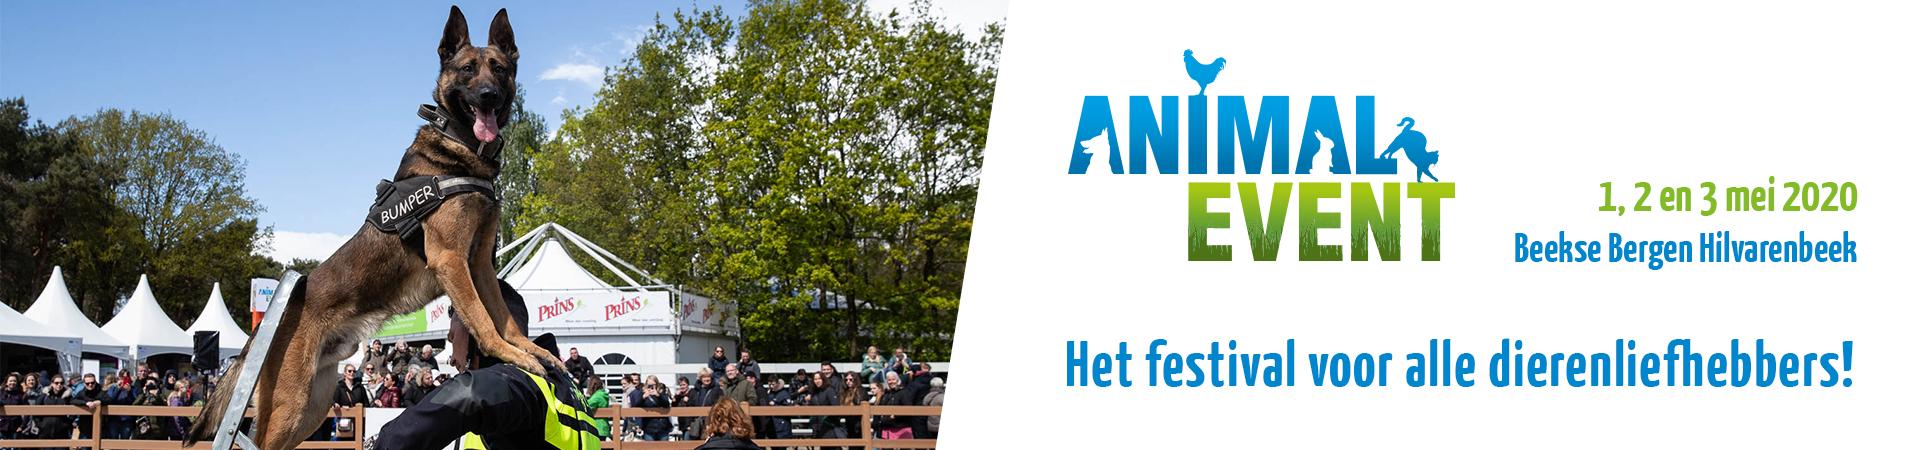 Kaartverkoop Animal Event 2020 Ticketpoint